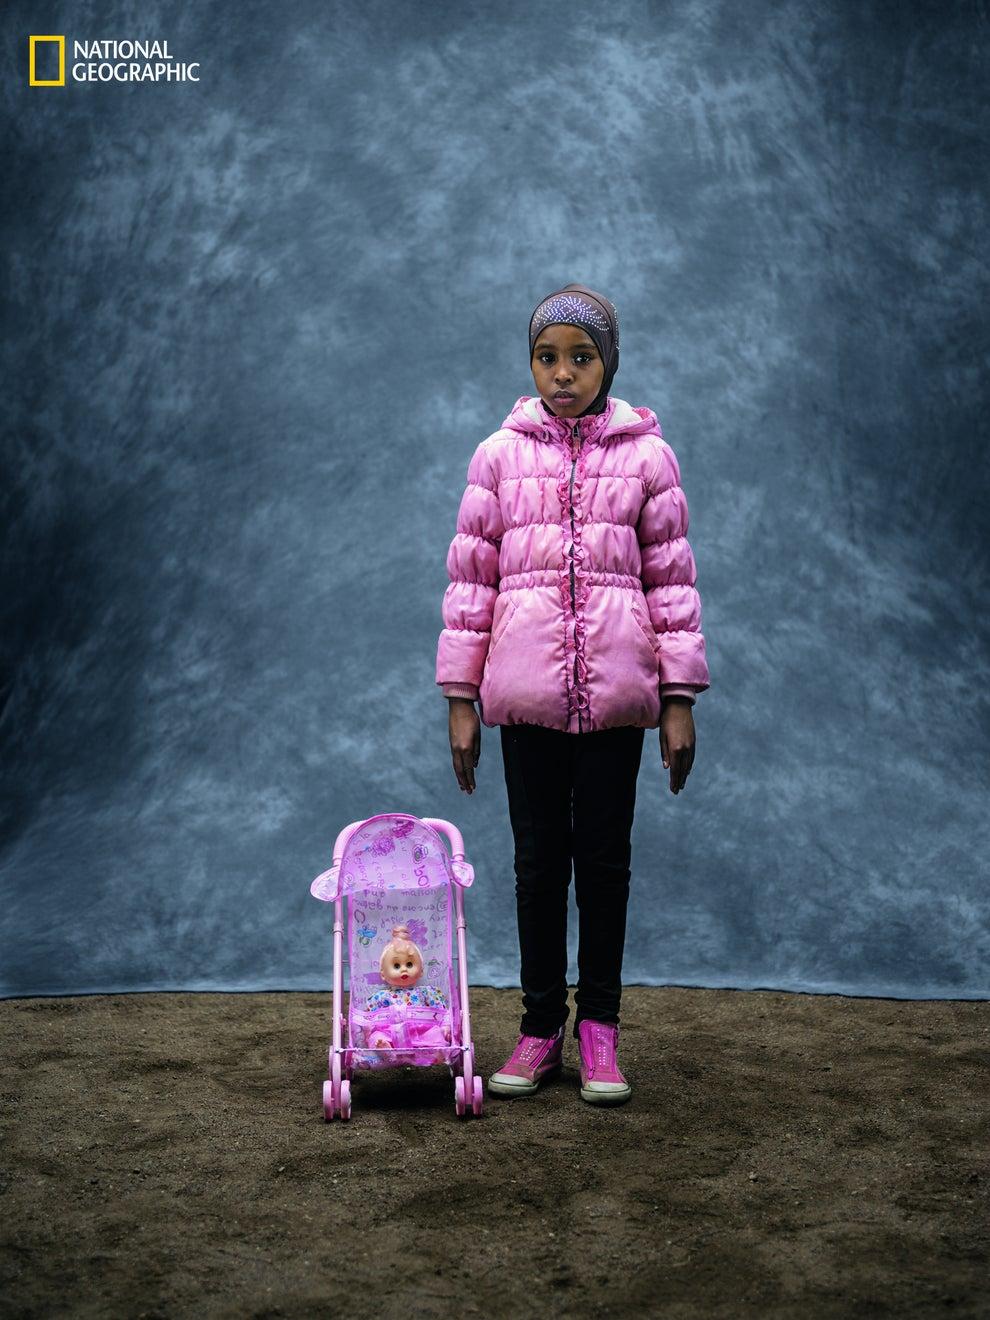 5. Isra Ali Saalad, age 10, Sweden.